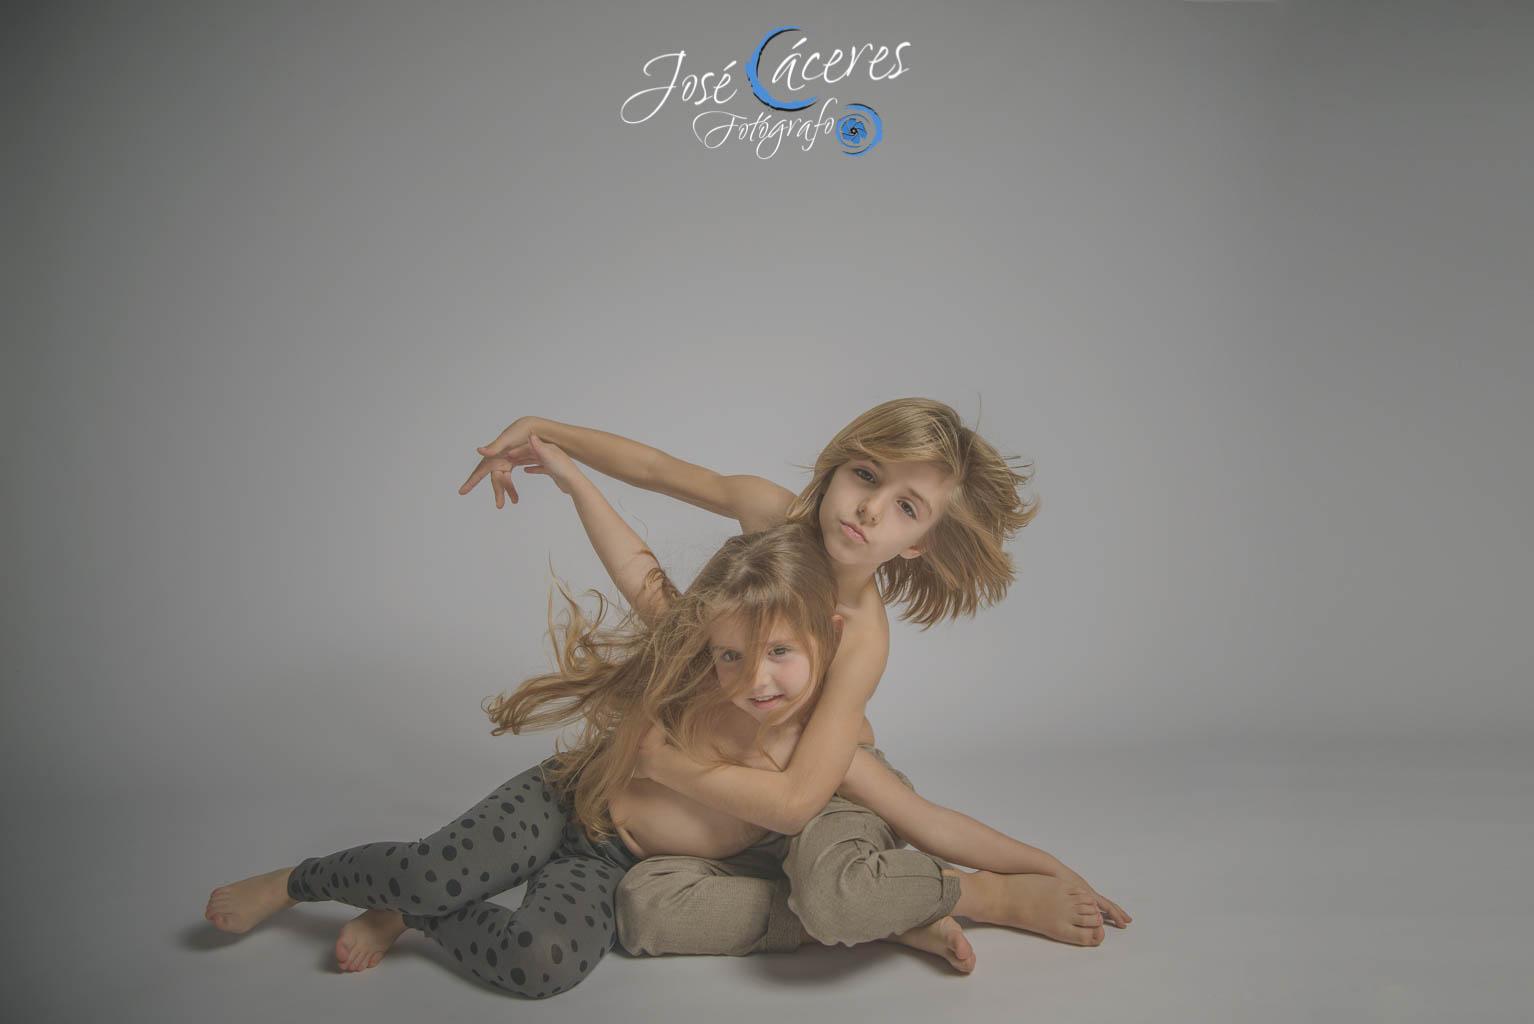 Jose Caceres Fotografia, Sesion Estudio Fotografia Niños-12